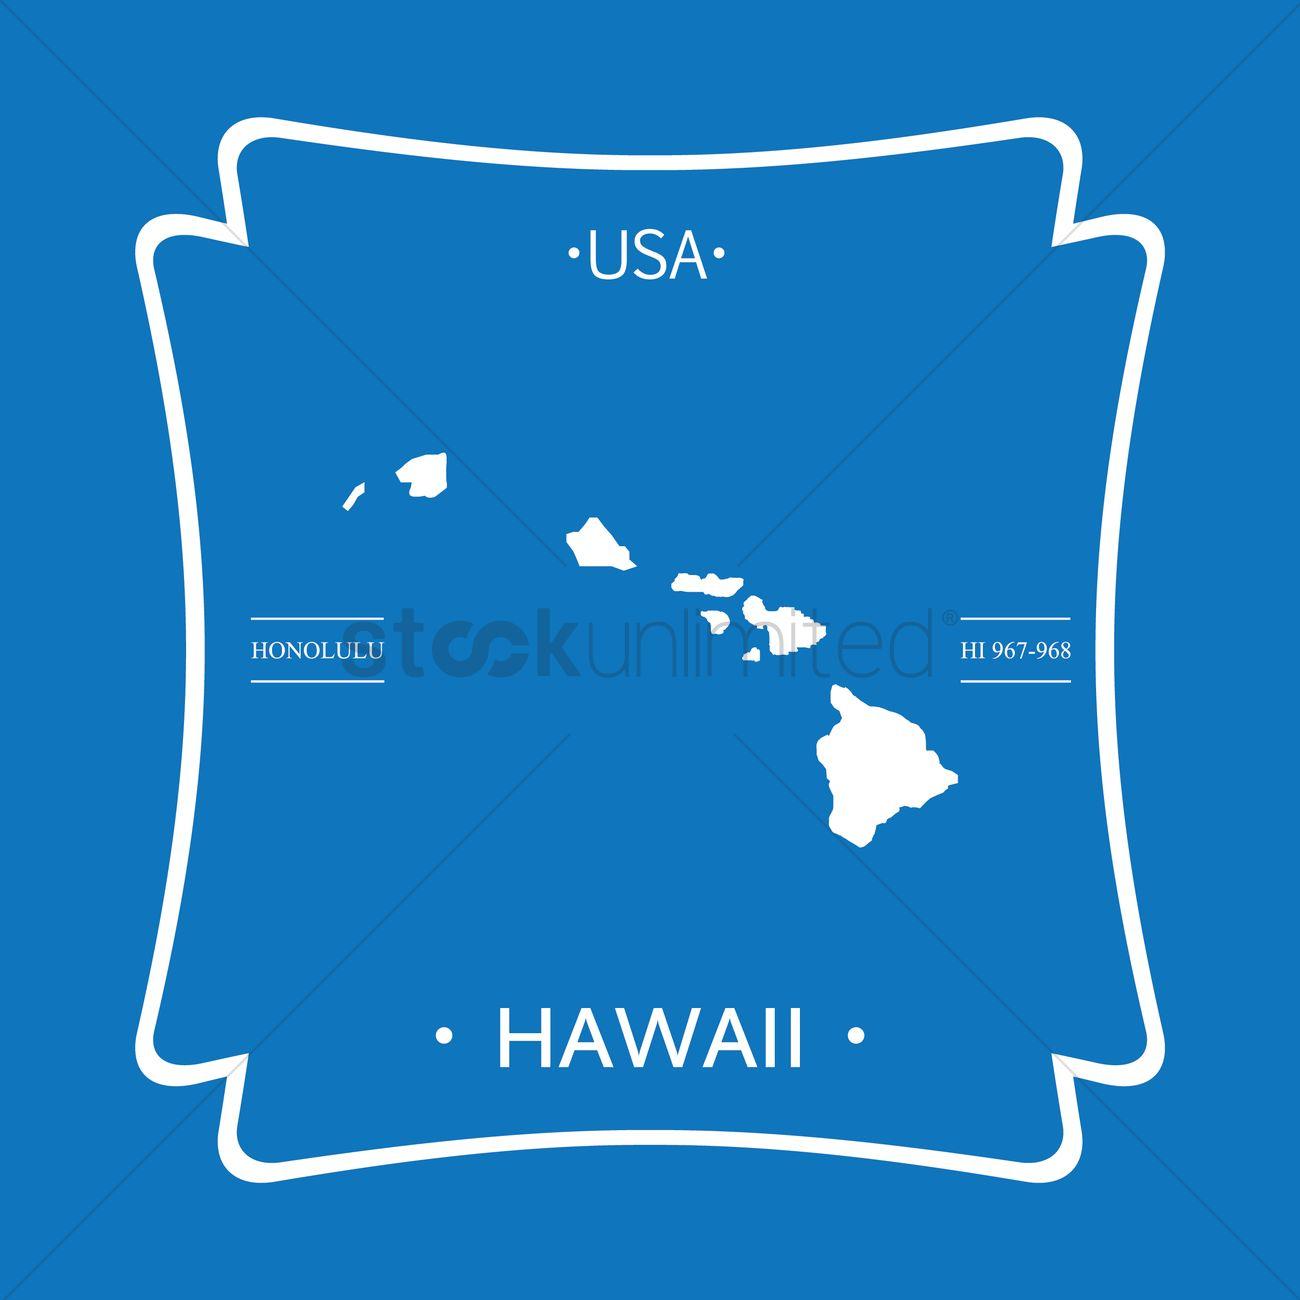 Hawaii Map Vector Image 1623736 Stockunlimited